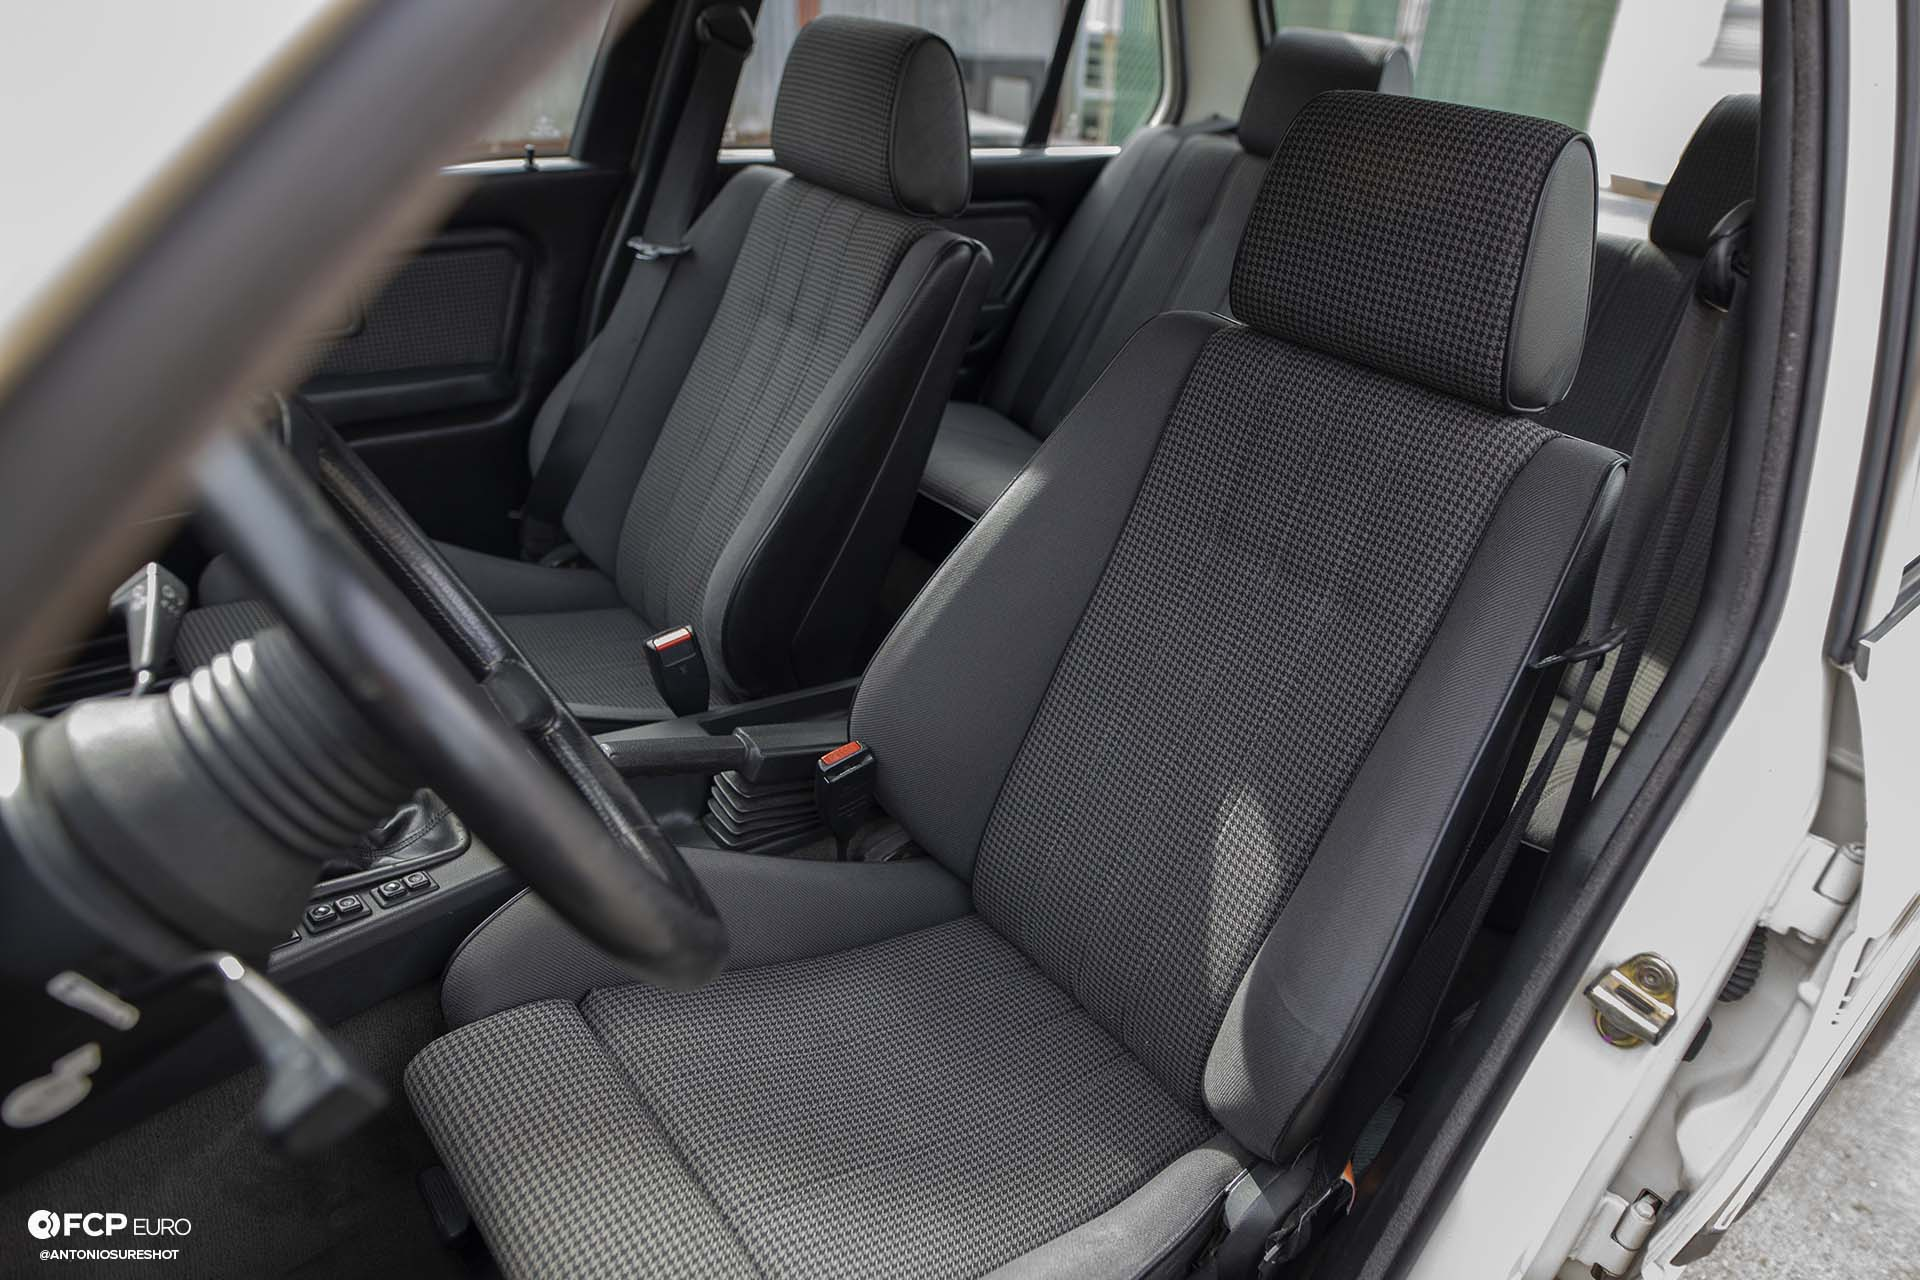 E30 BMW Hartge H26 Houndstooth Seats